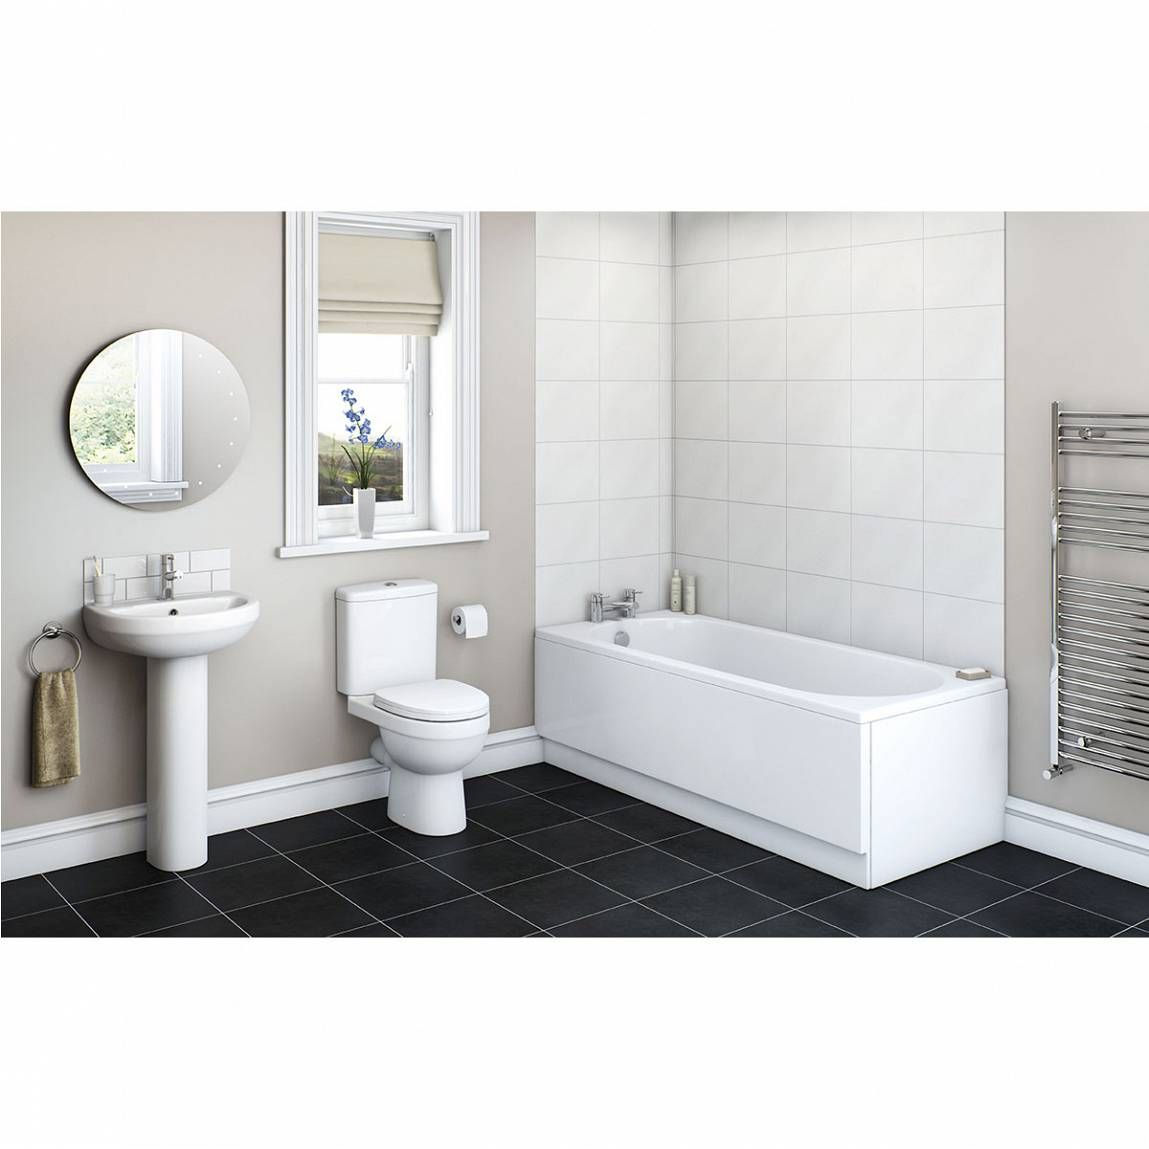 energy bathroom set with richmond 1700 x 700 bath suite victoria plumb - Bathroom Accessories Victoria Plumb